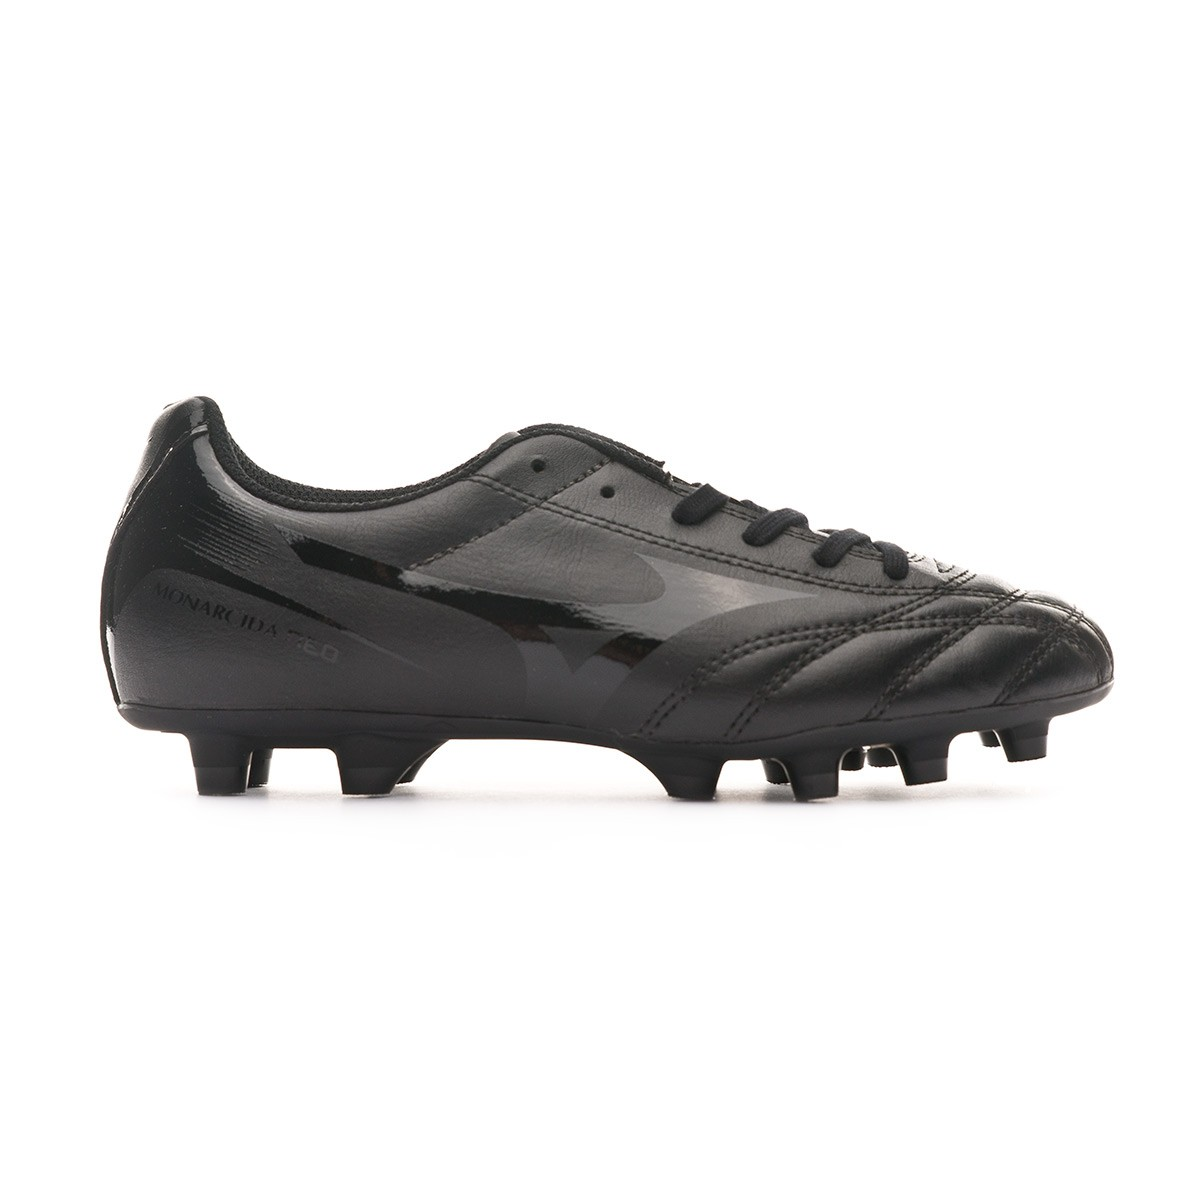 scarpe calcio mizuno bambino